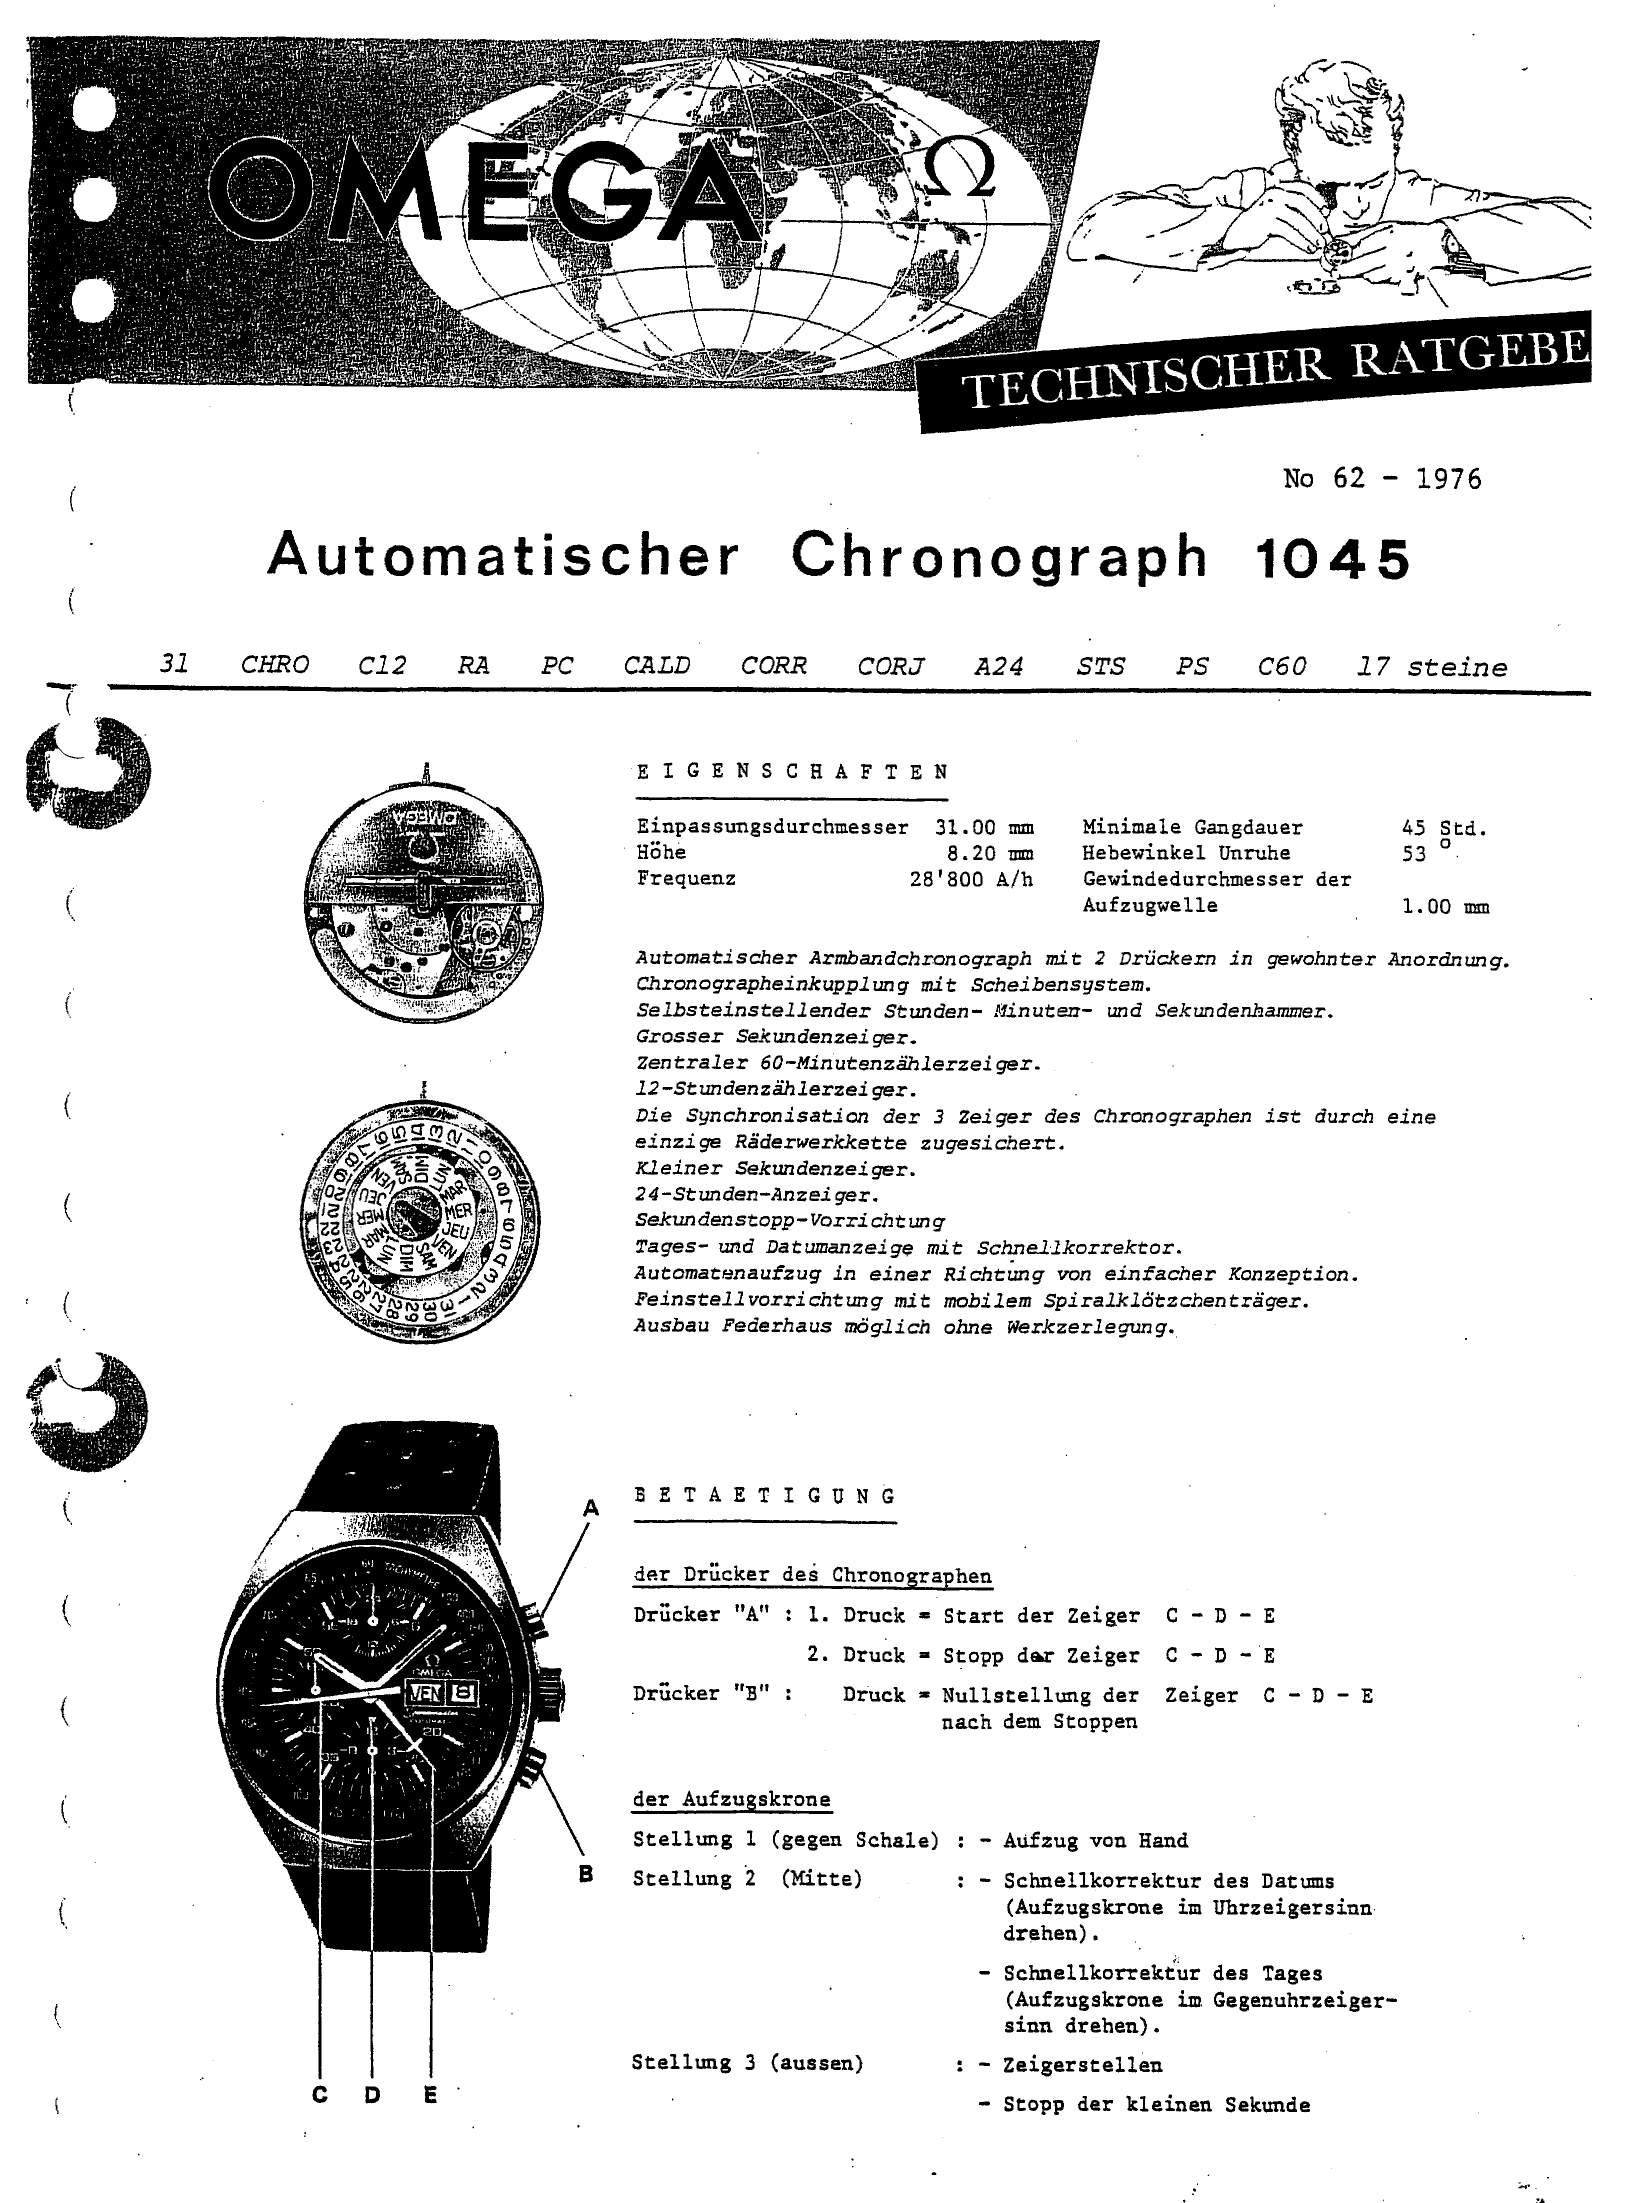 Omega c.1045 Chronograph Service Manual